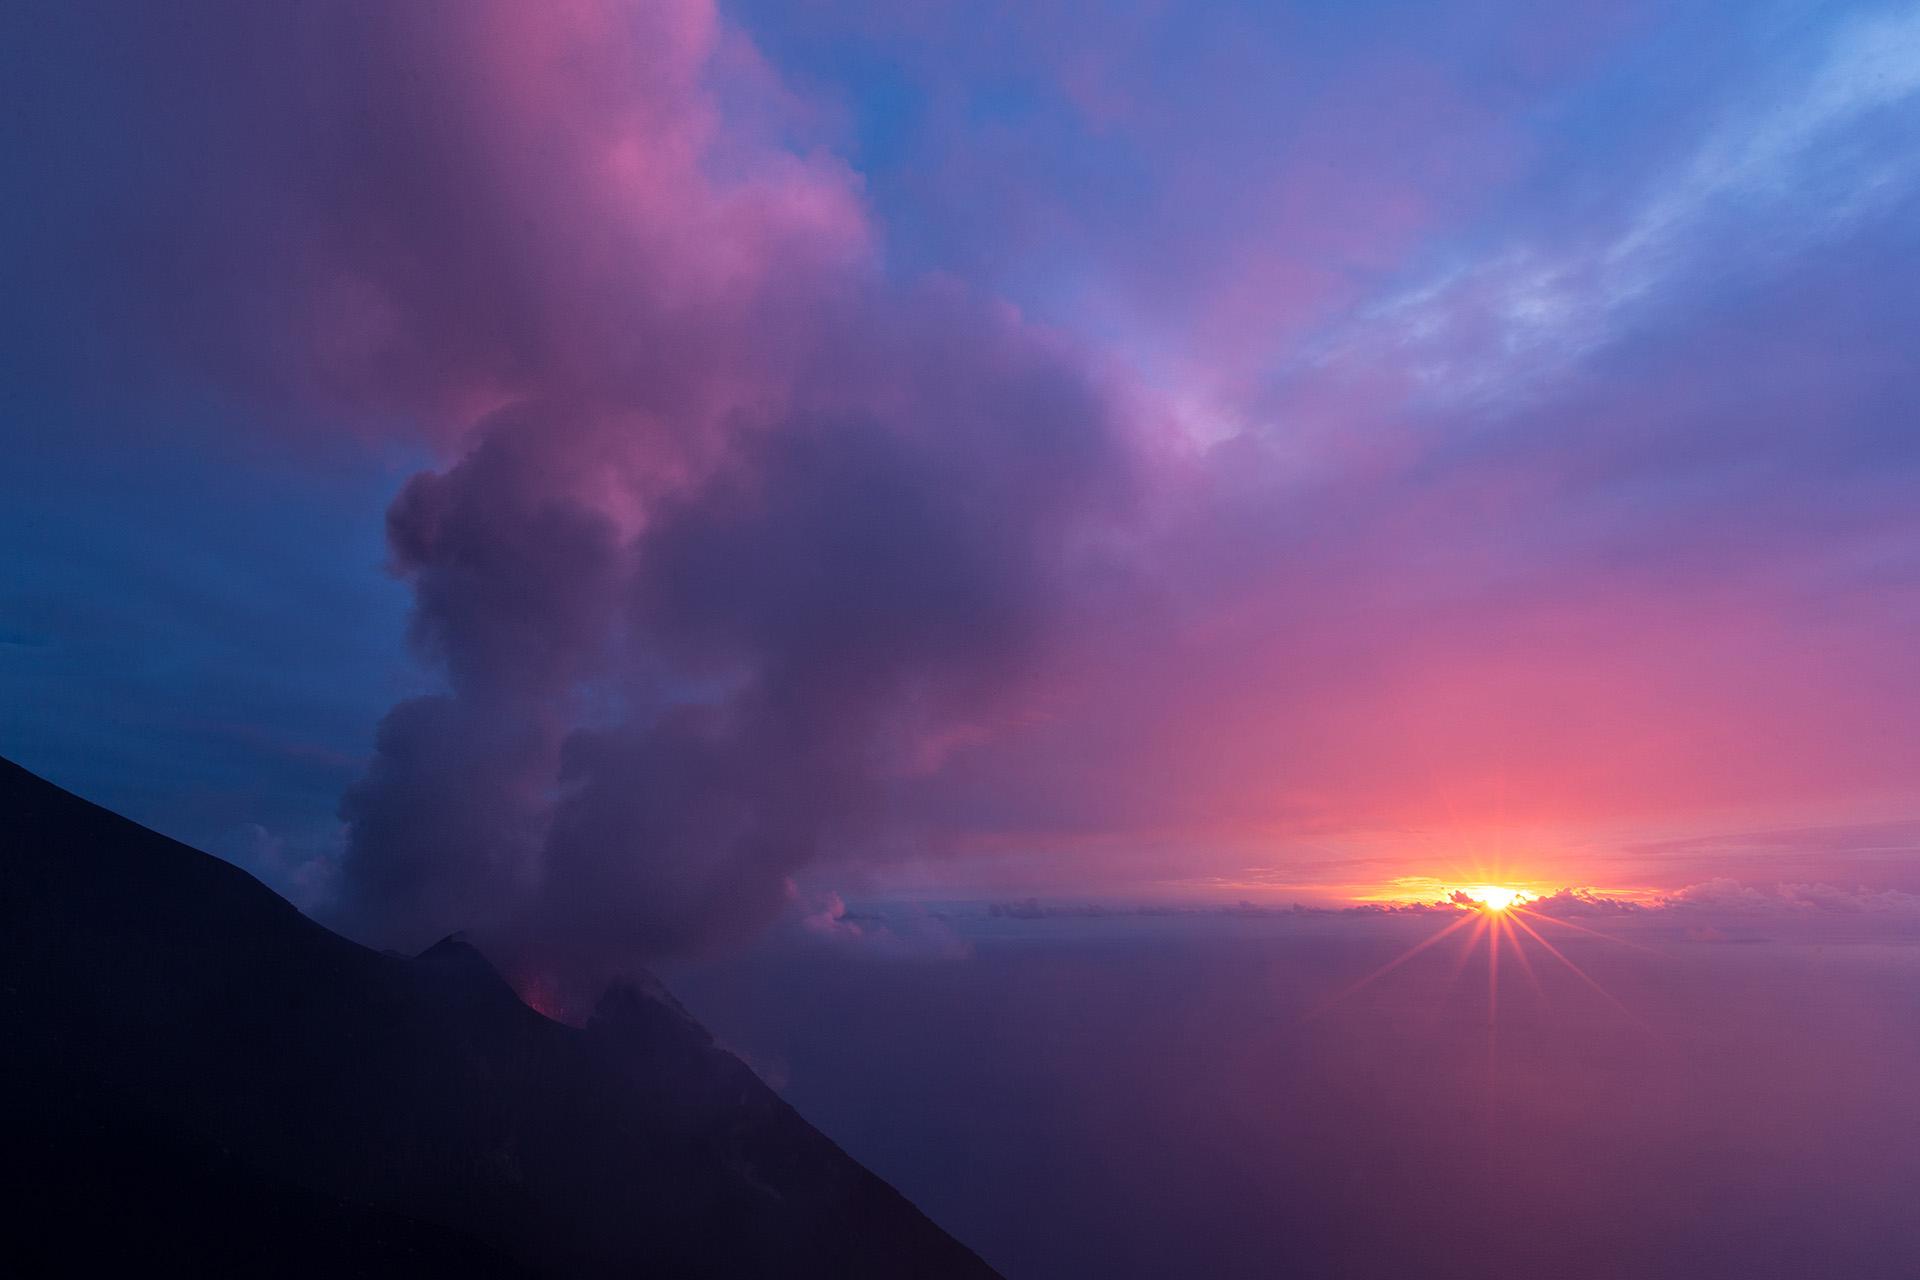 l04-vulkanausbruch-nd